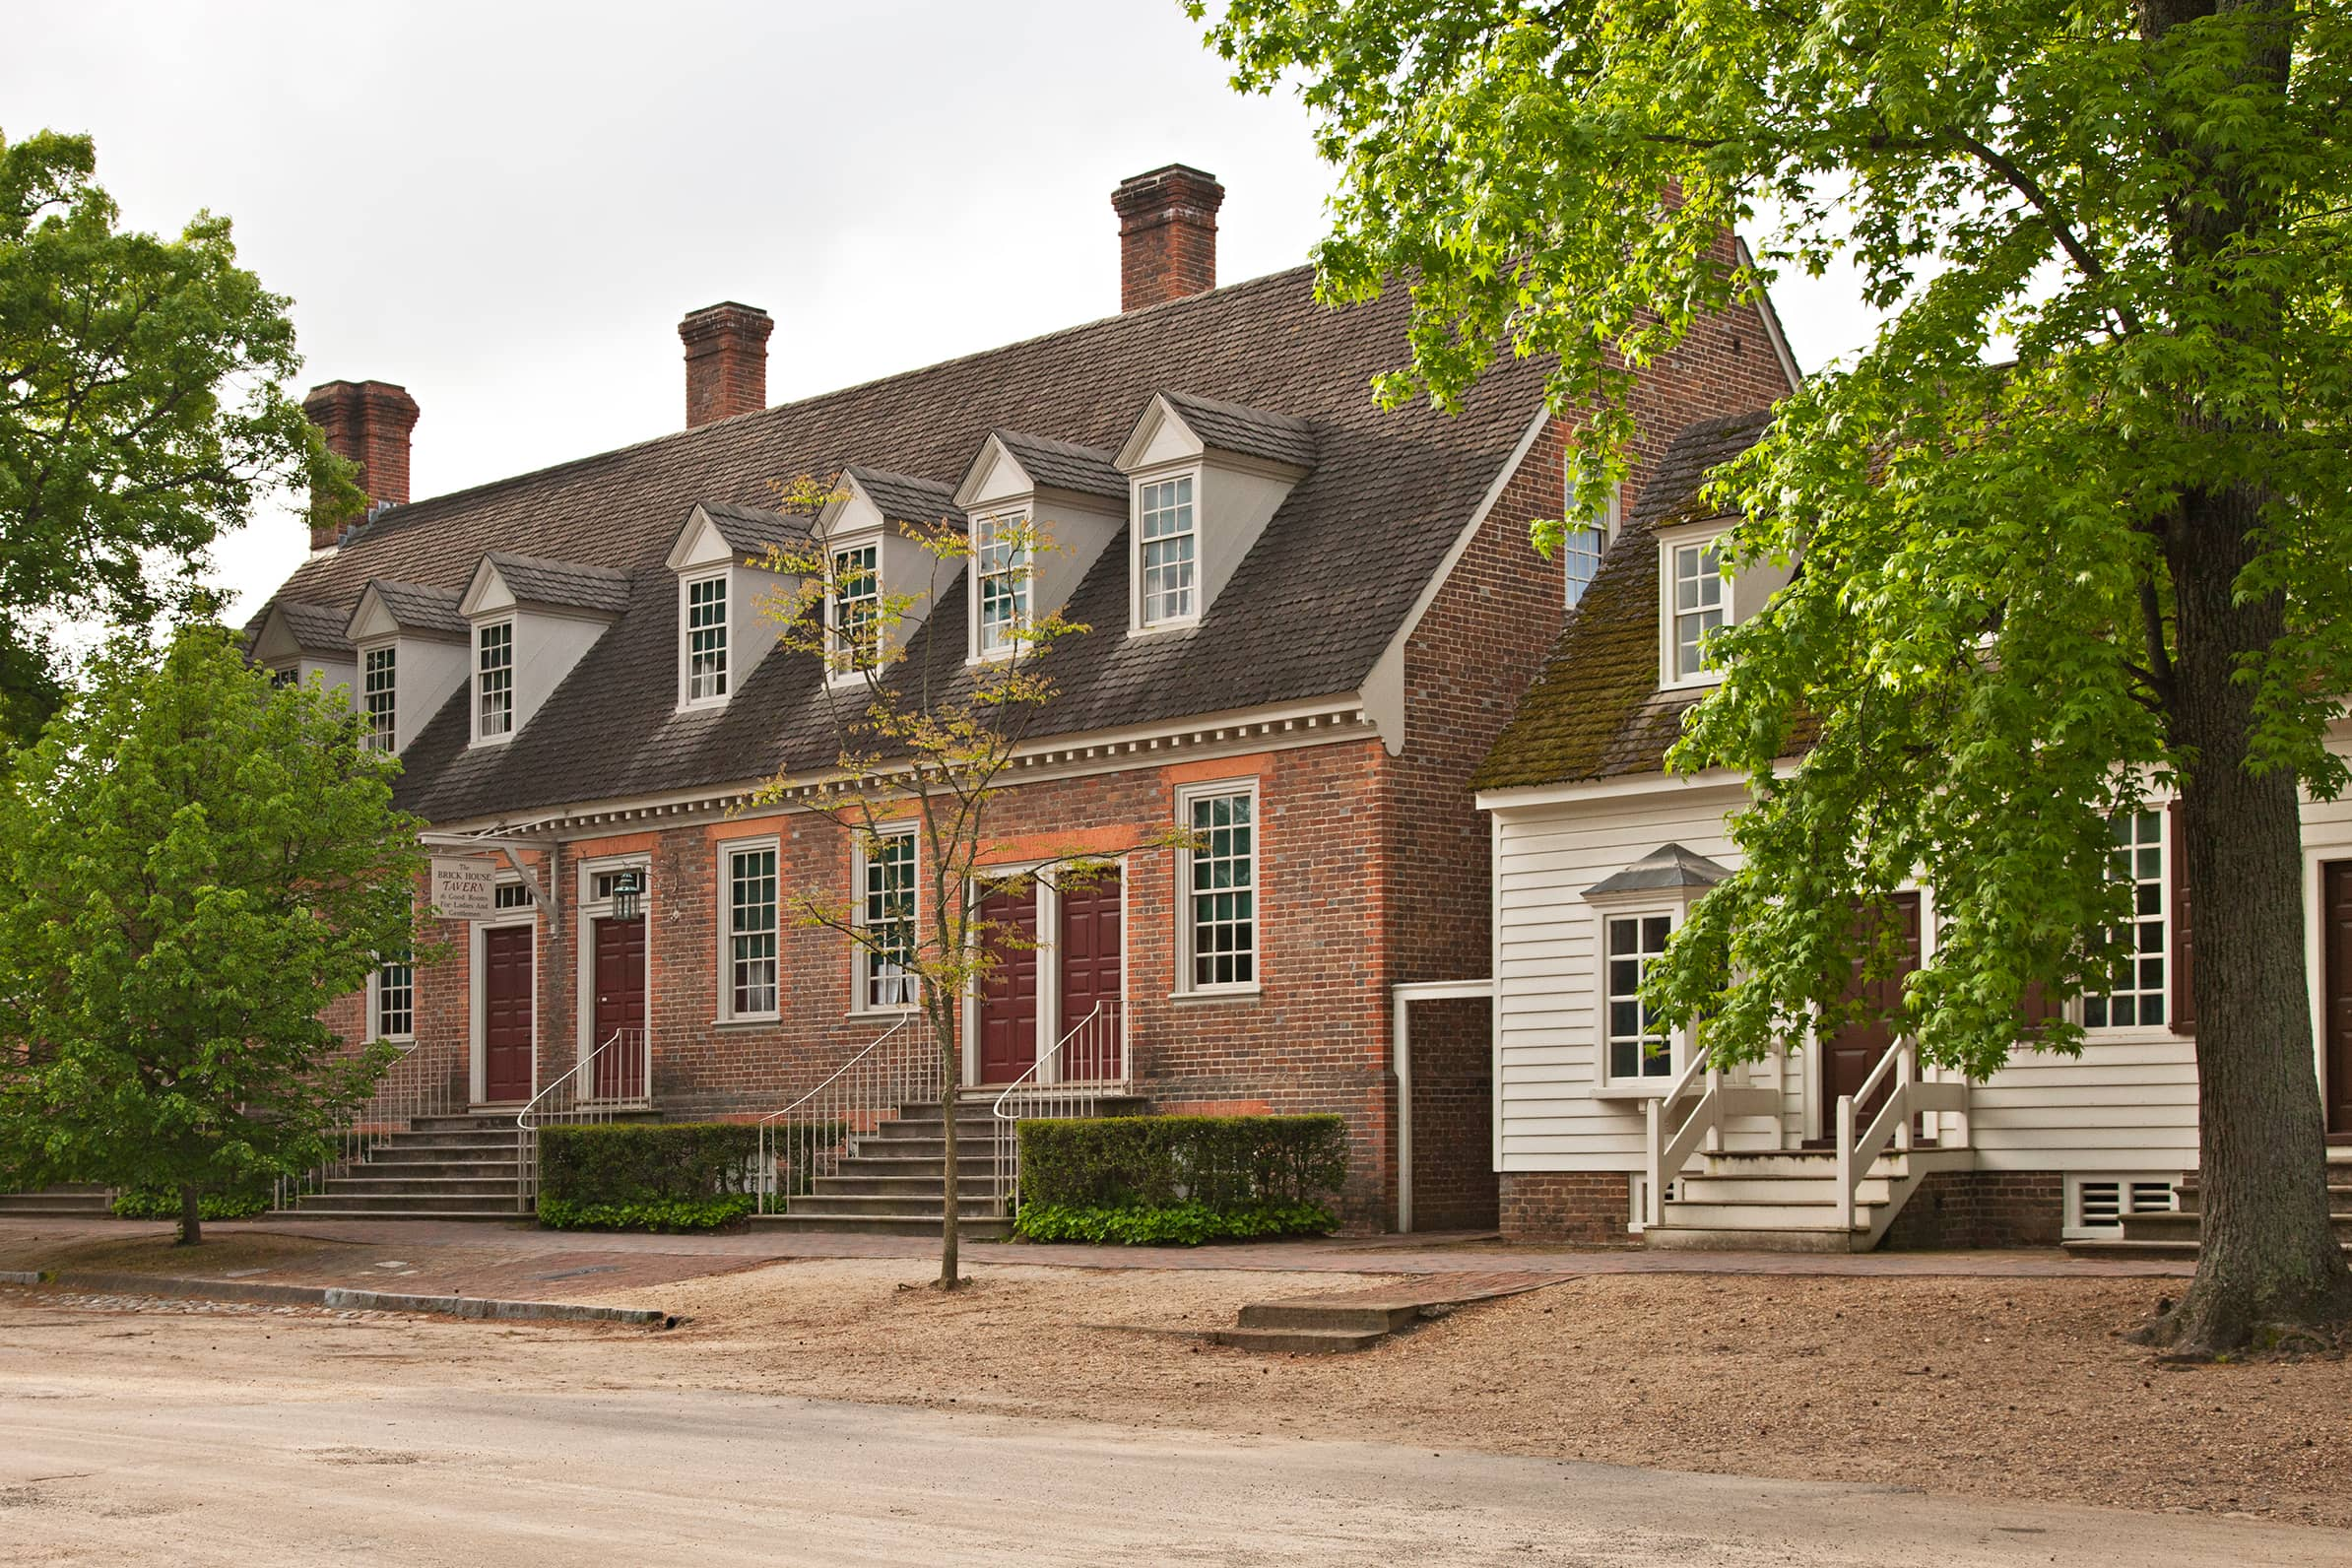 The Brick House Tavern